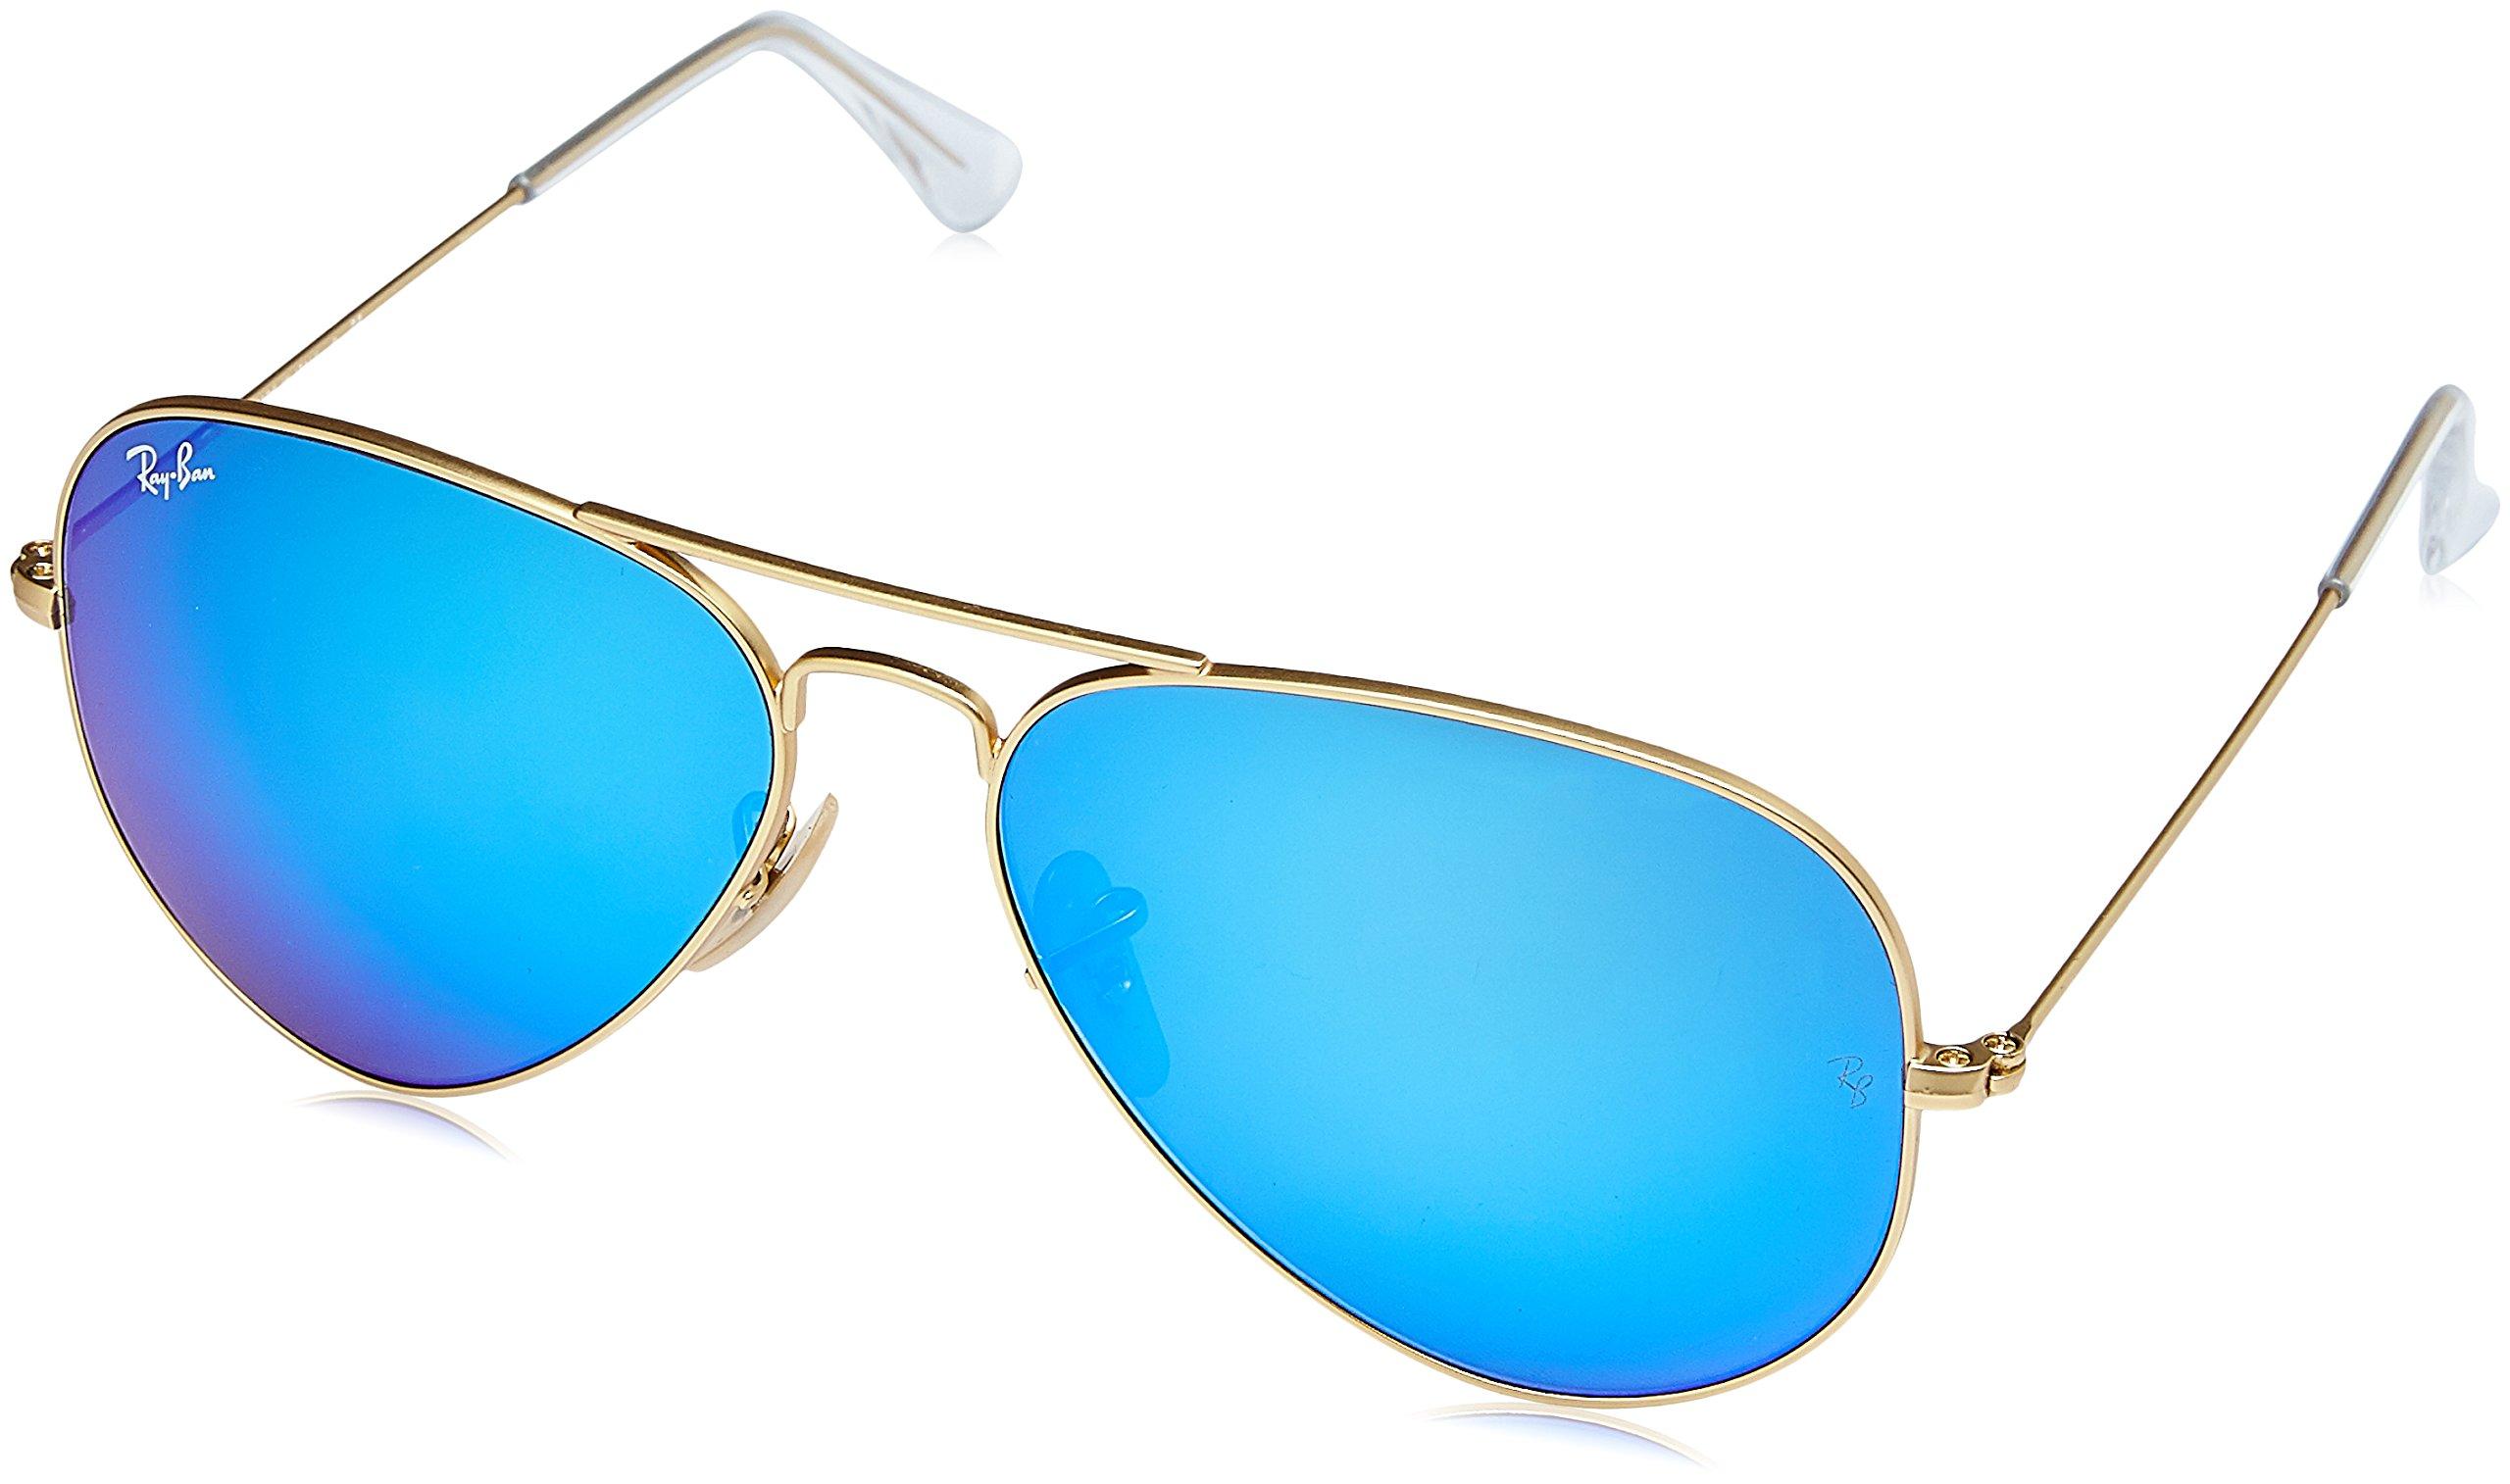 Ray-Ban RB3025 Aviator Flash Mirrored Sunglasses, Matte Gold/Blue Flash, 58 mm